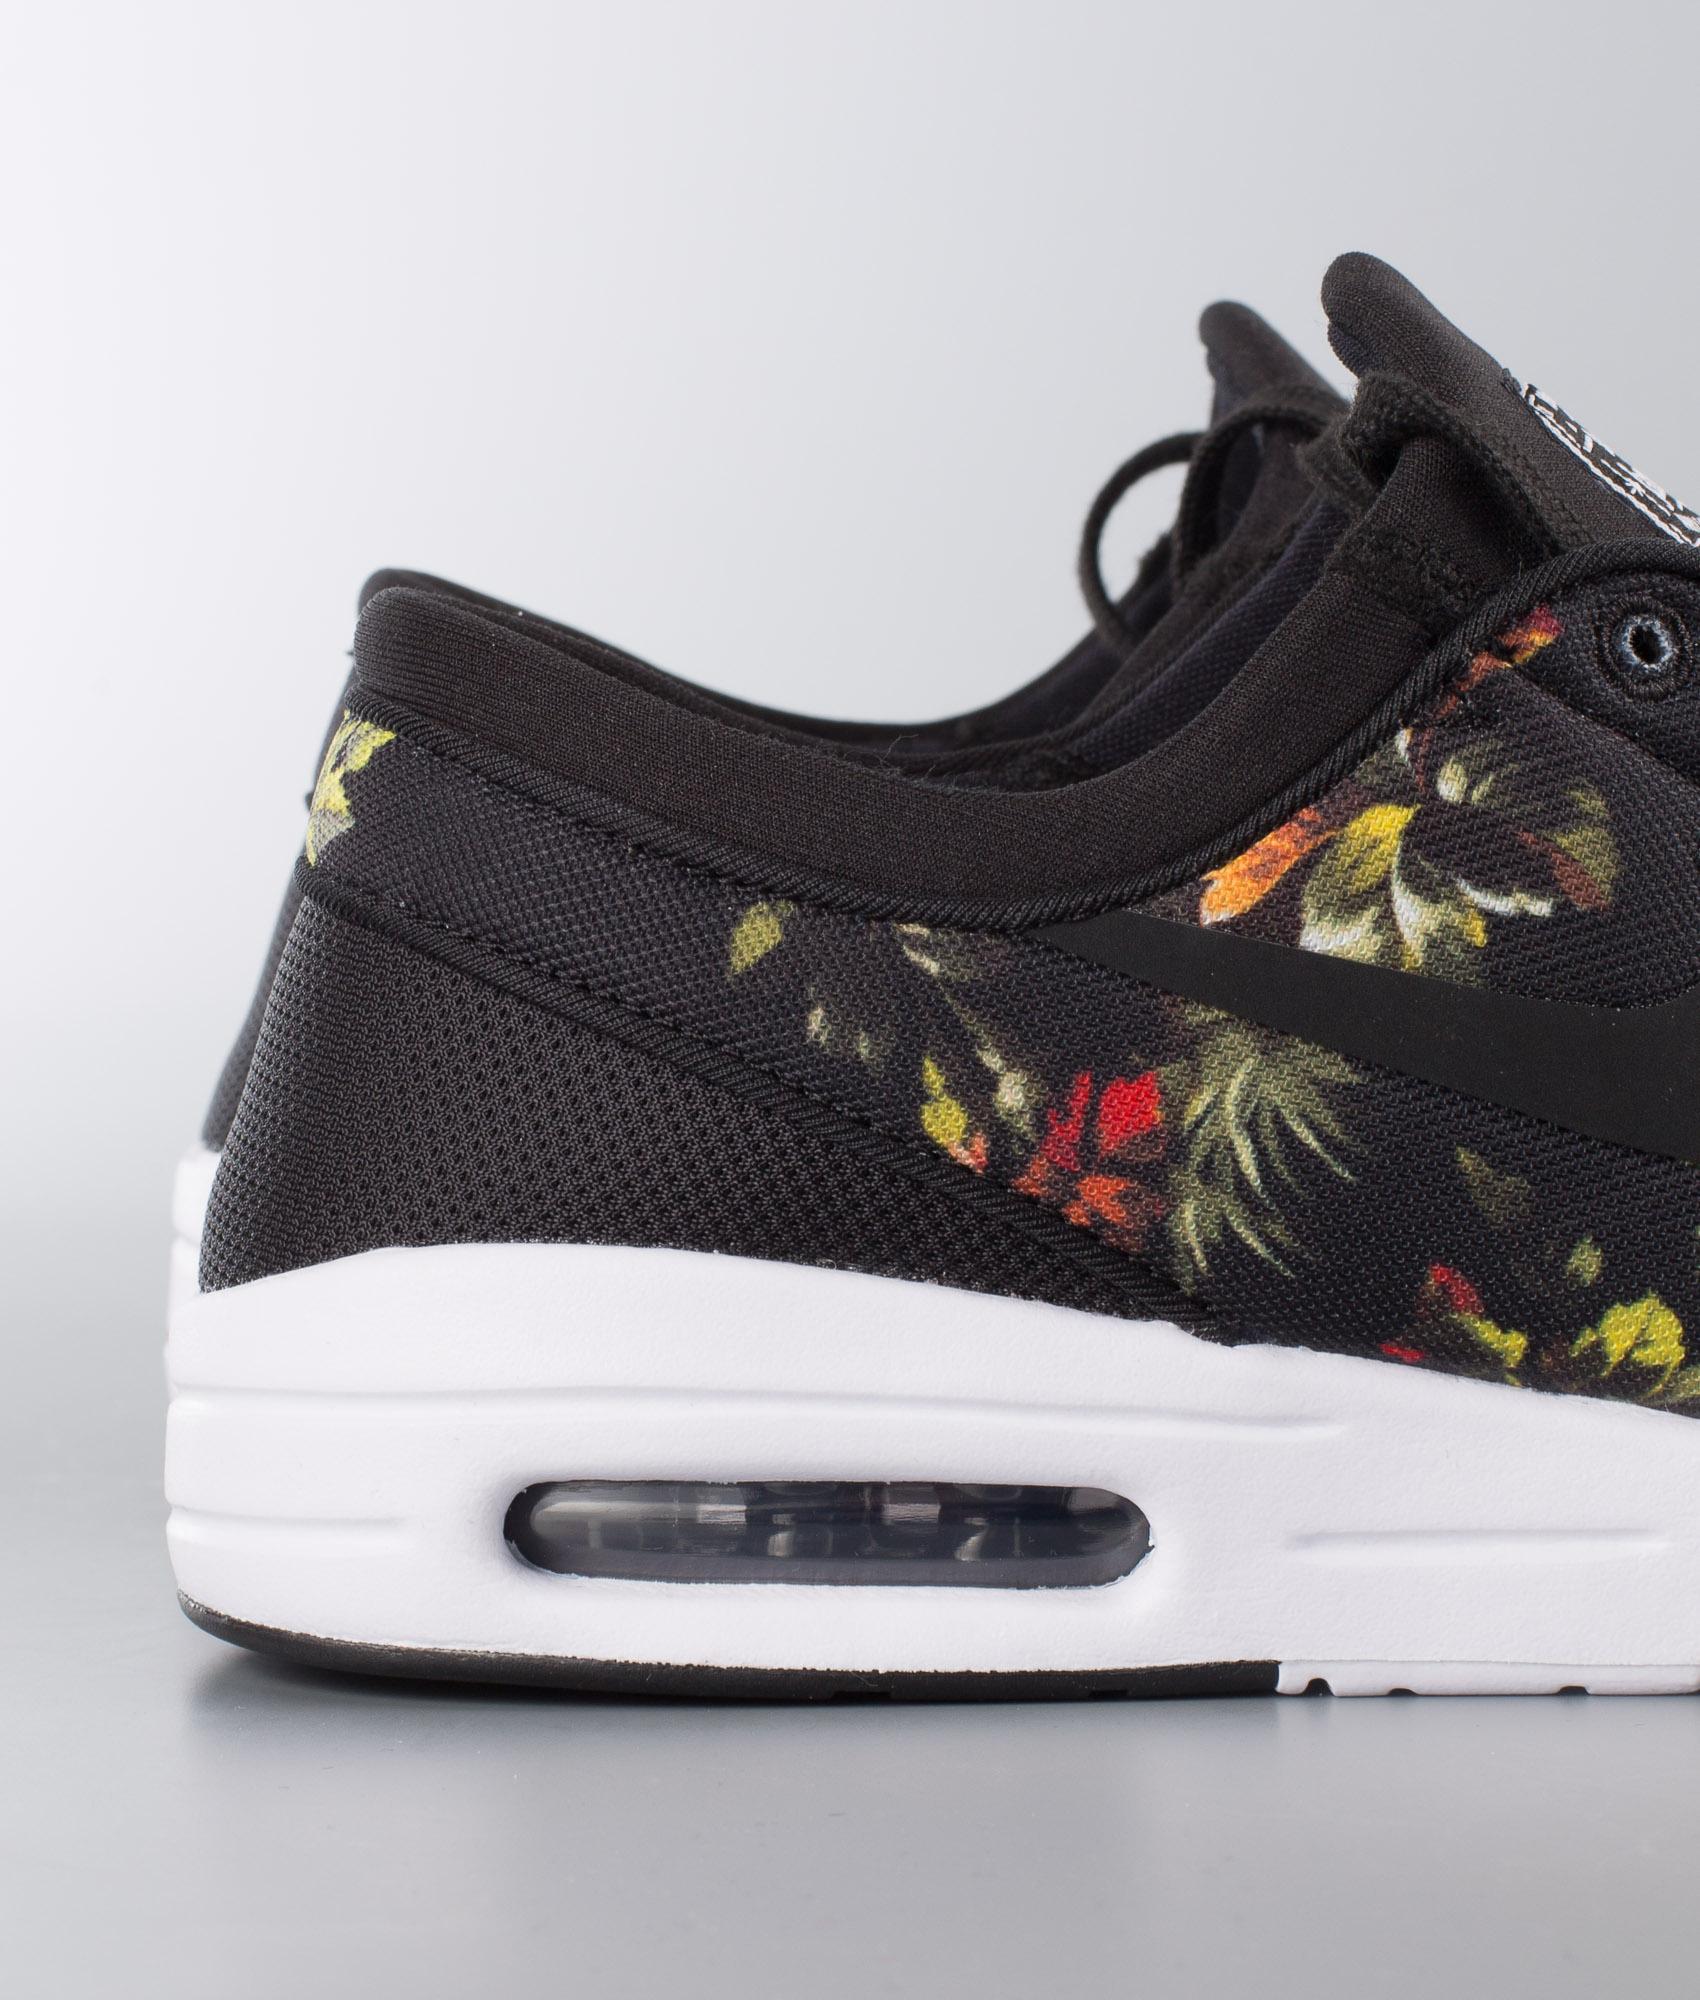 Nike Stefan Janoski Max Shoes BlackBlack Multi Color